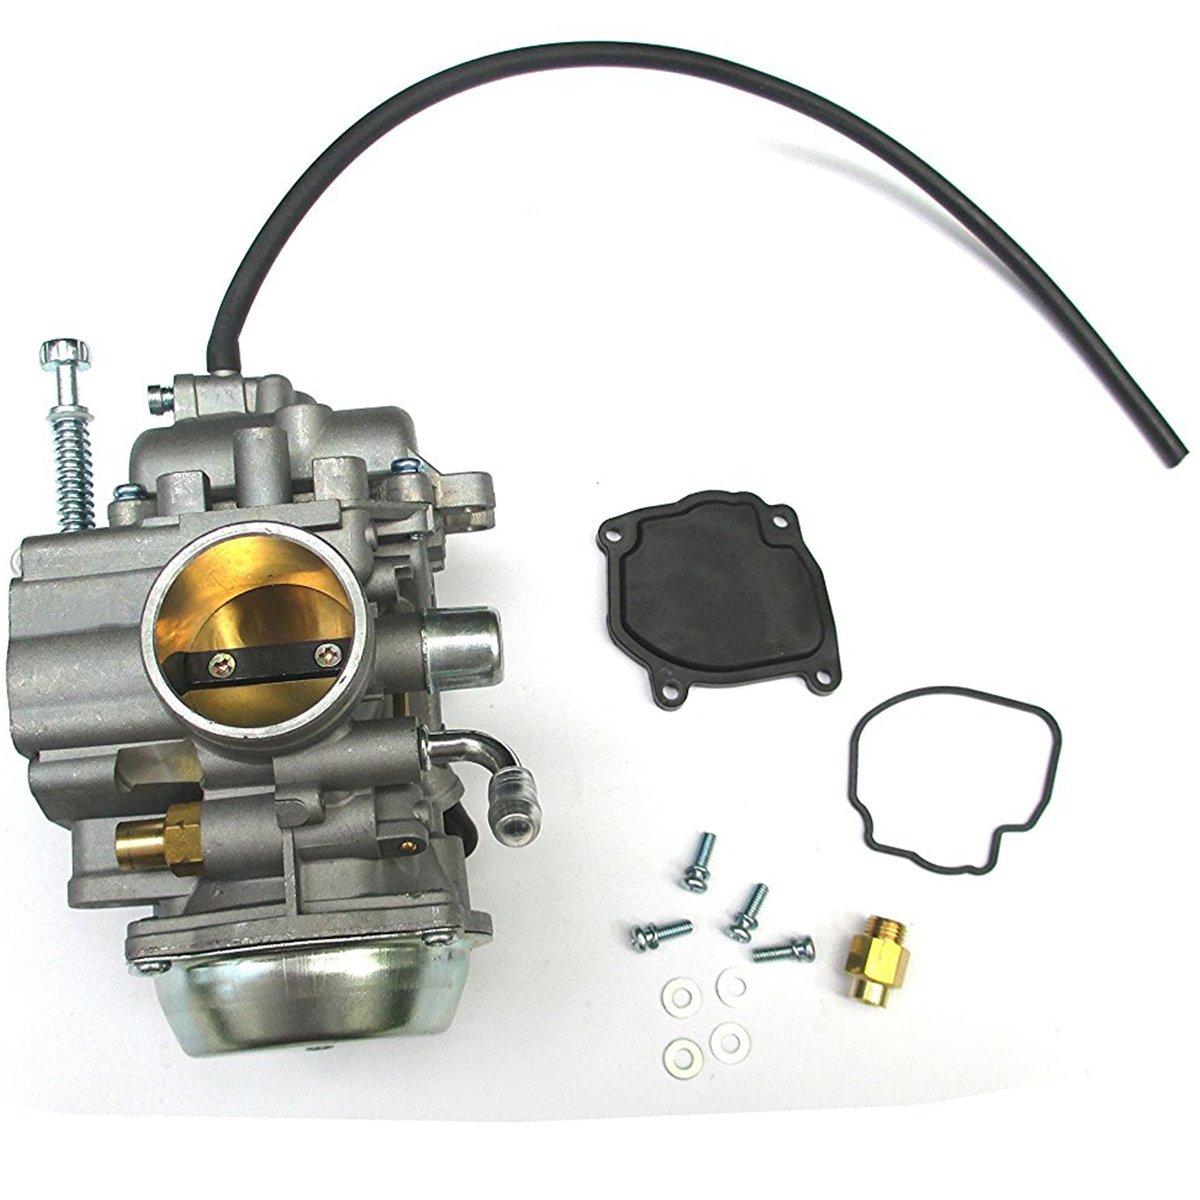 Carburetor Carb for POLARIS MAGNUM 500 4x4 2x4 ATV QUAD CARB 1999-2002 by Amhousejoy RUIAN HAOCHENG VEHICLE PARTS